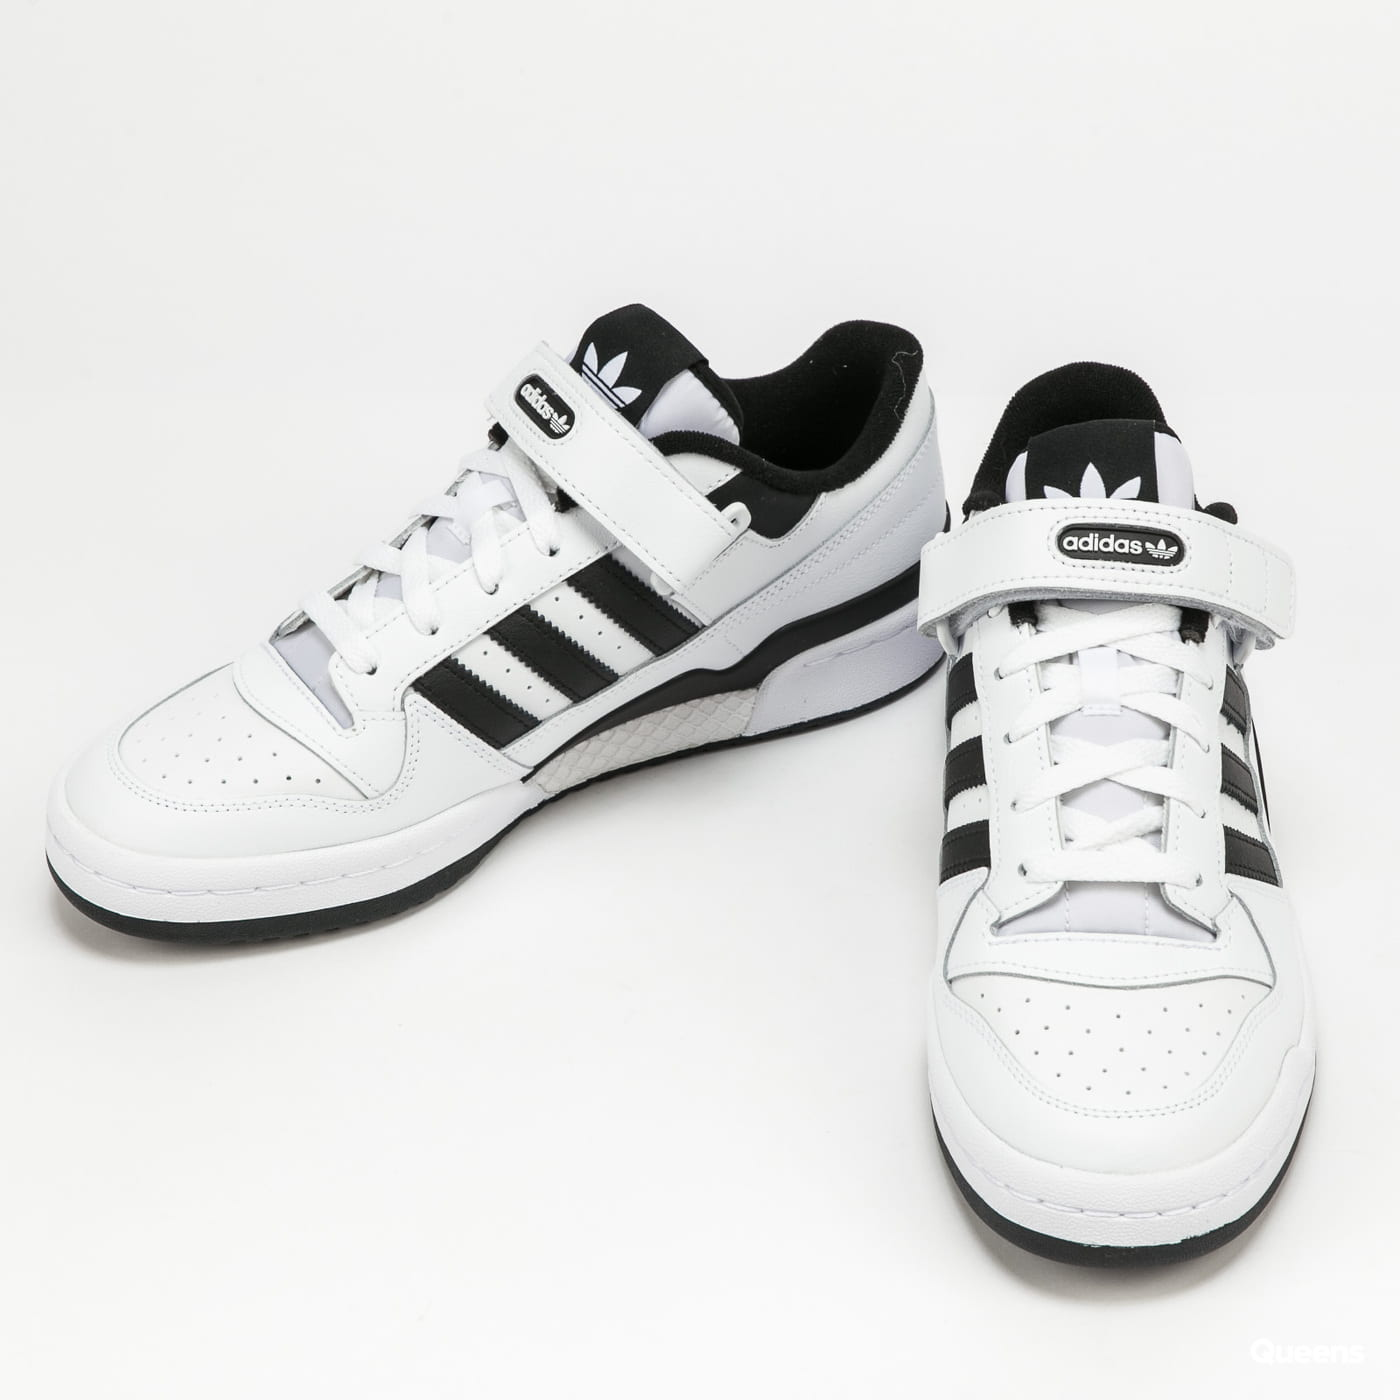 adidas Originals Forum Low ftwwht / ftwwht / cblack